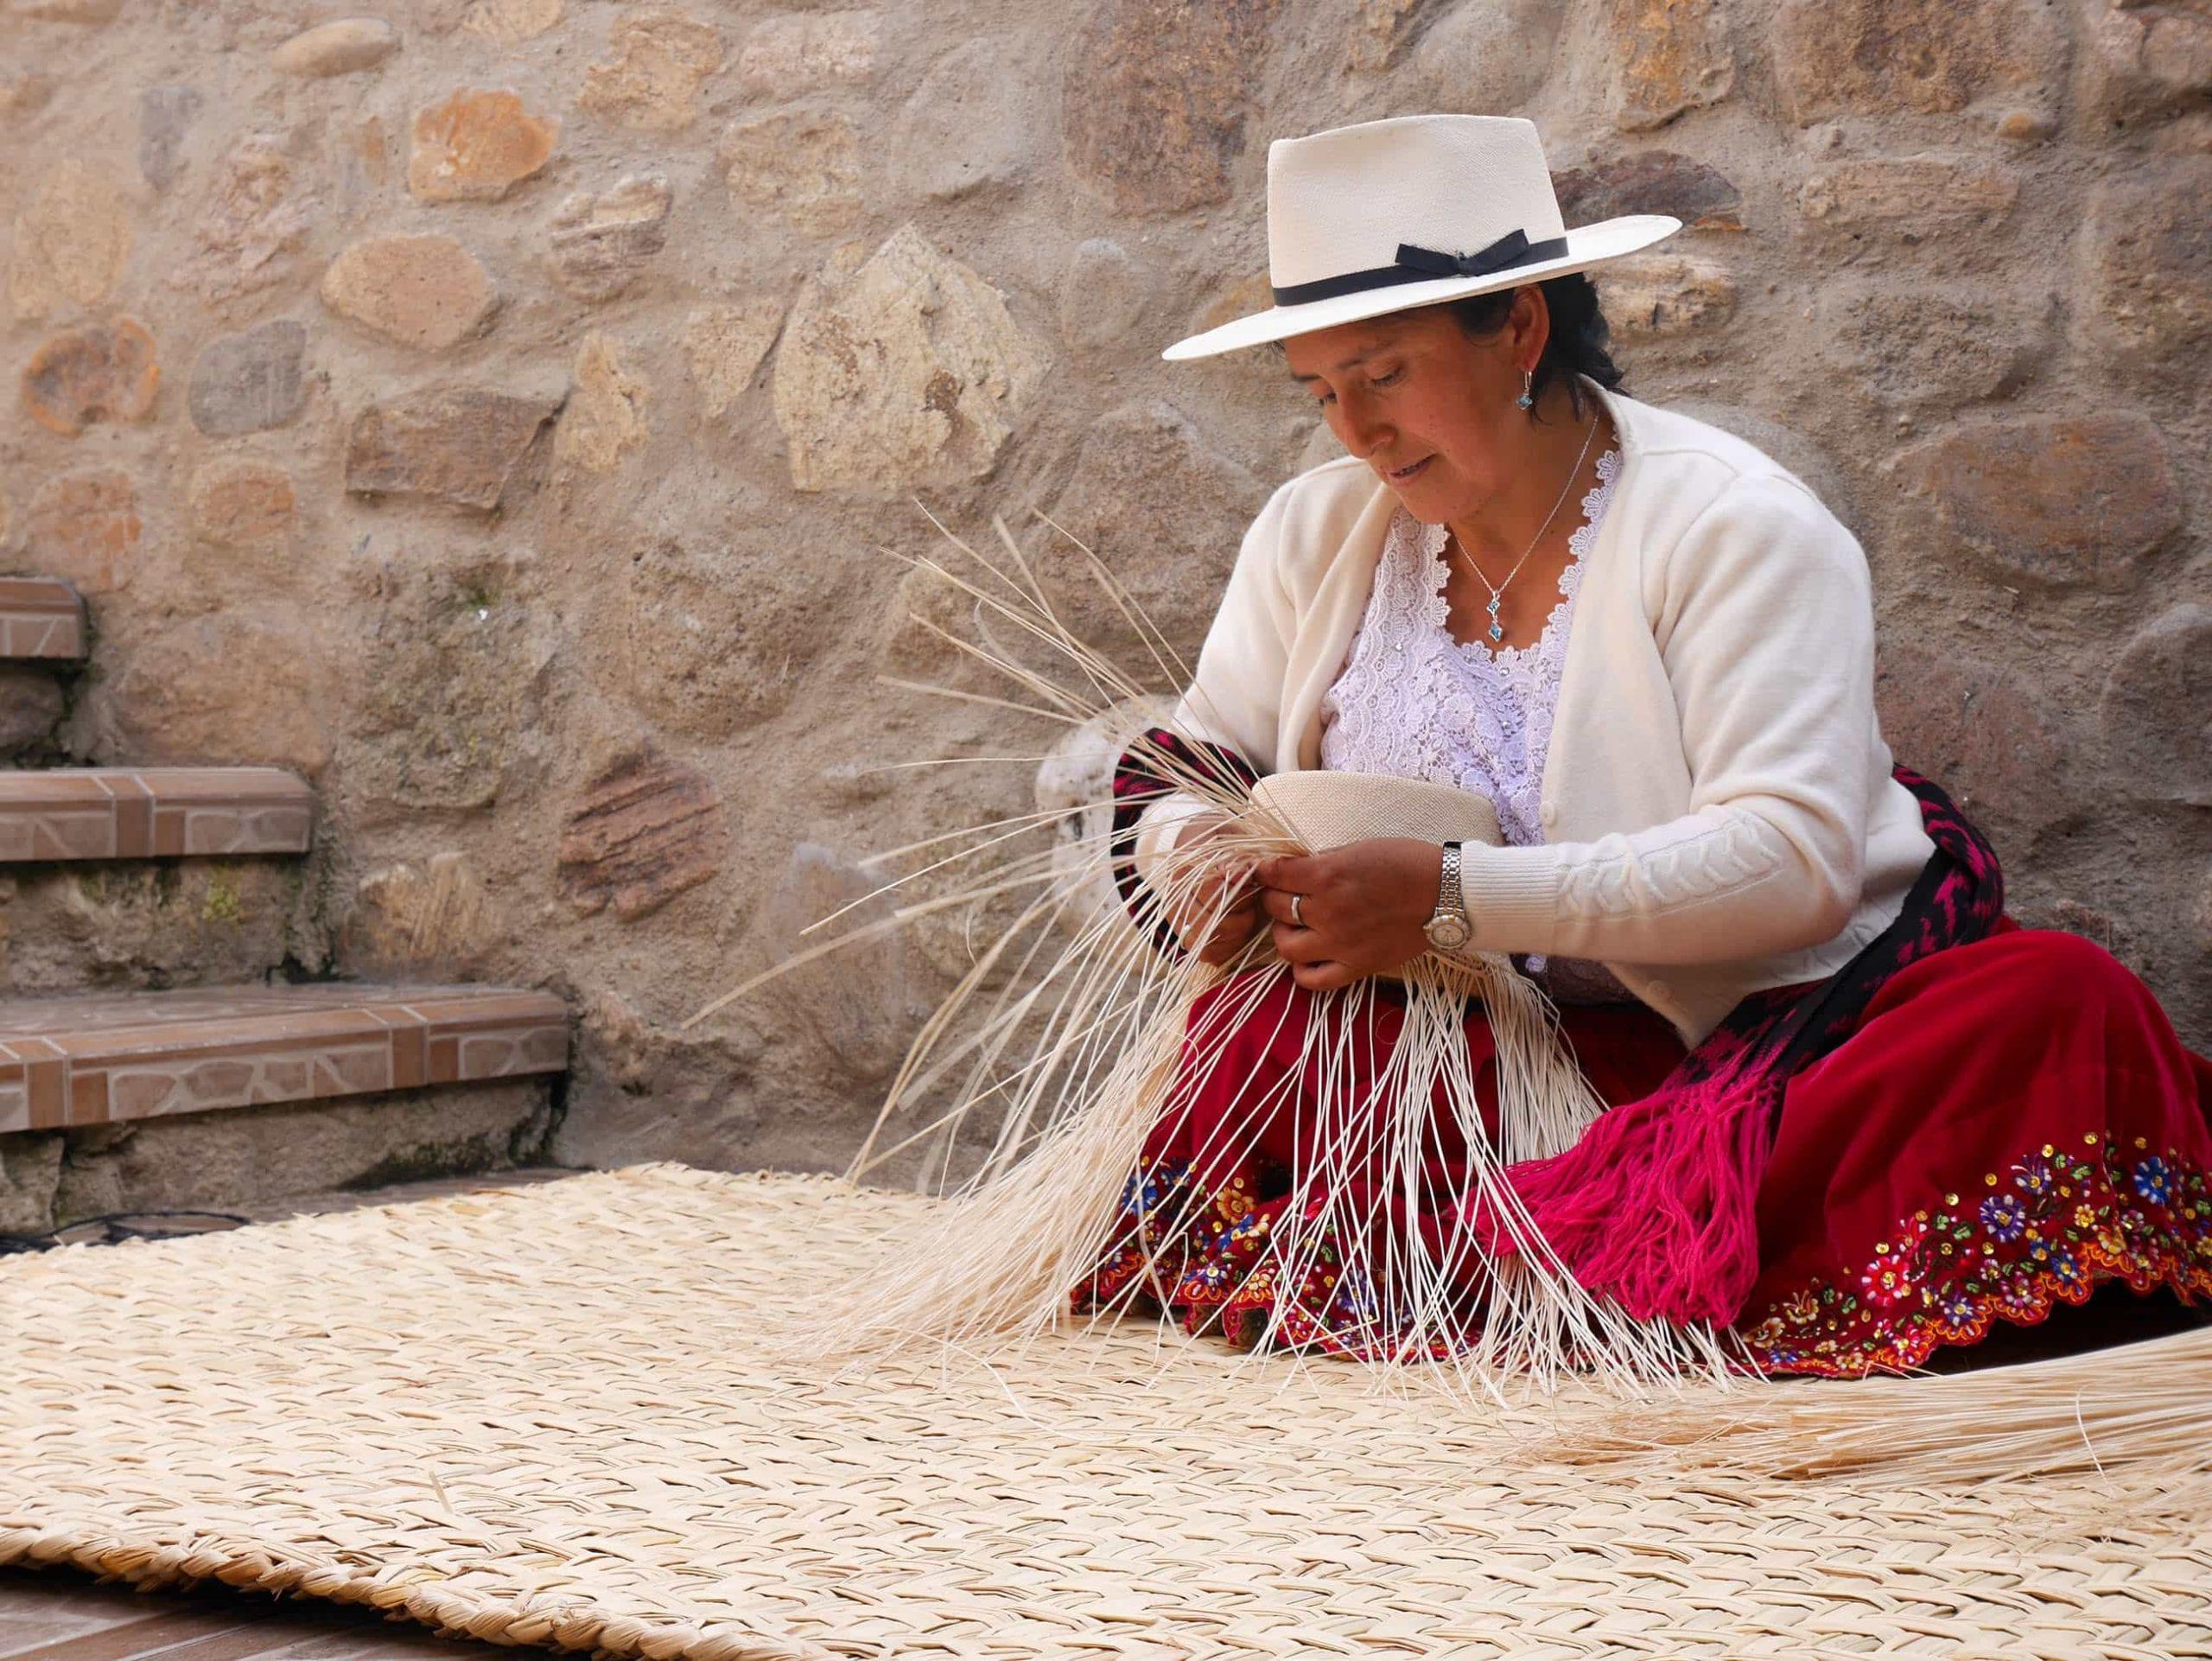 female_hat_weavers_hand_weaving_panamas_ecaudor